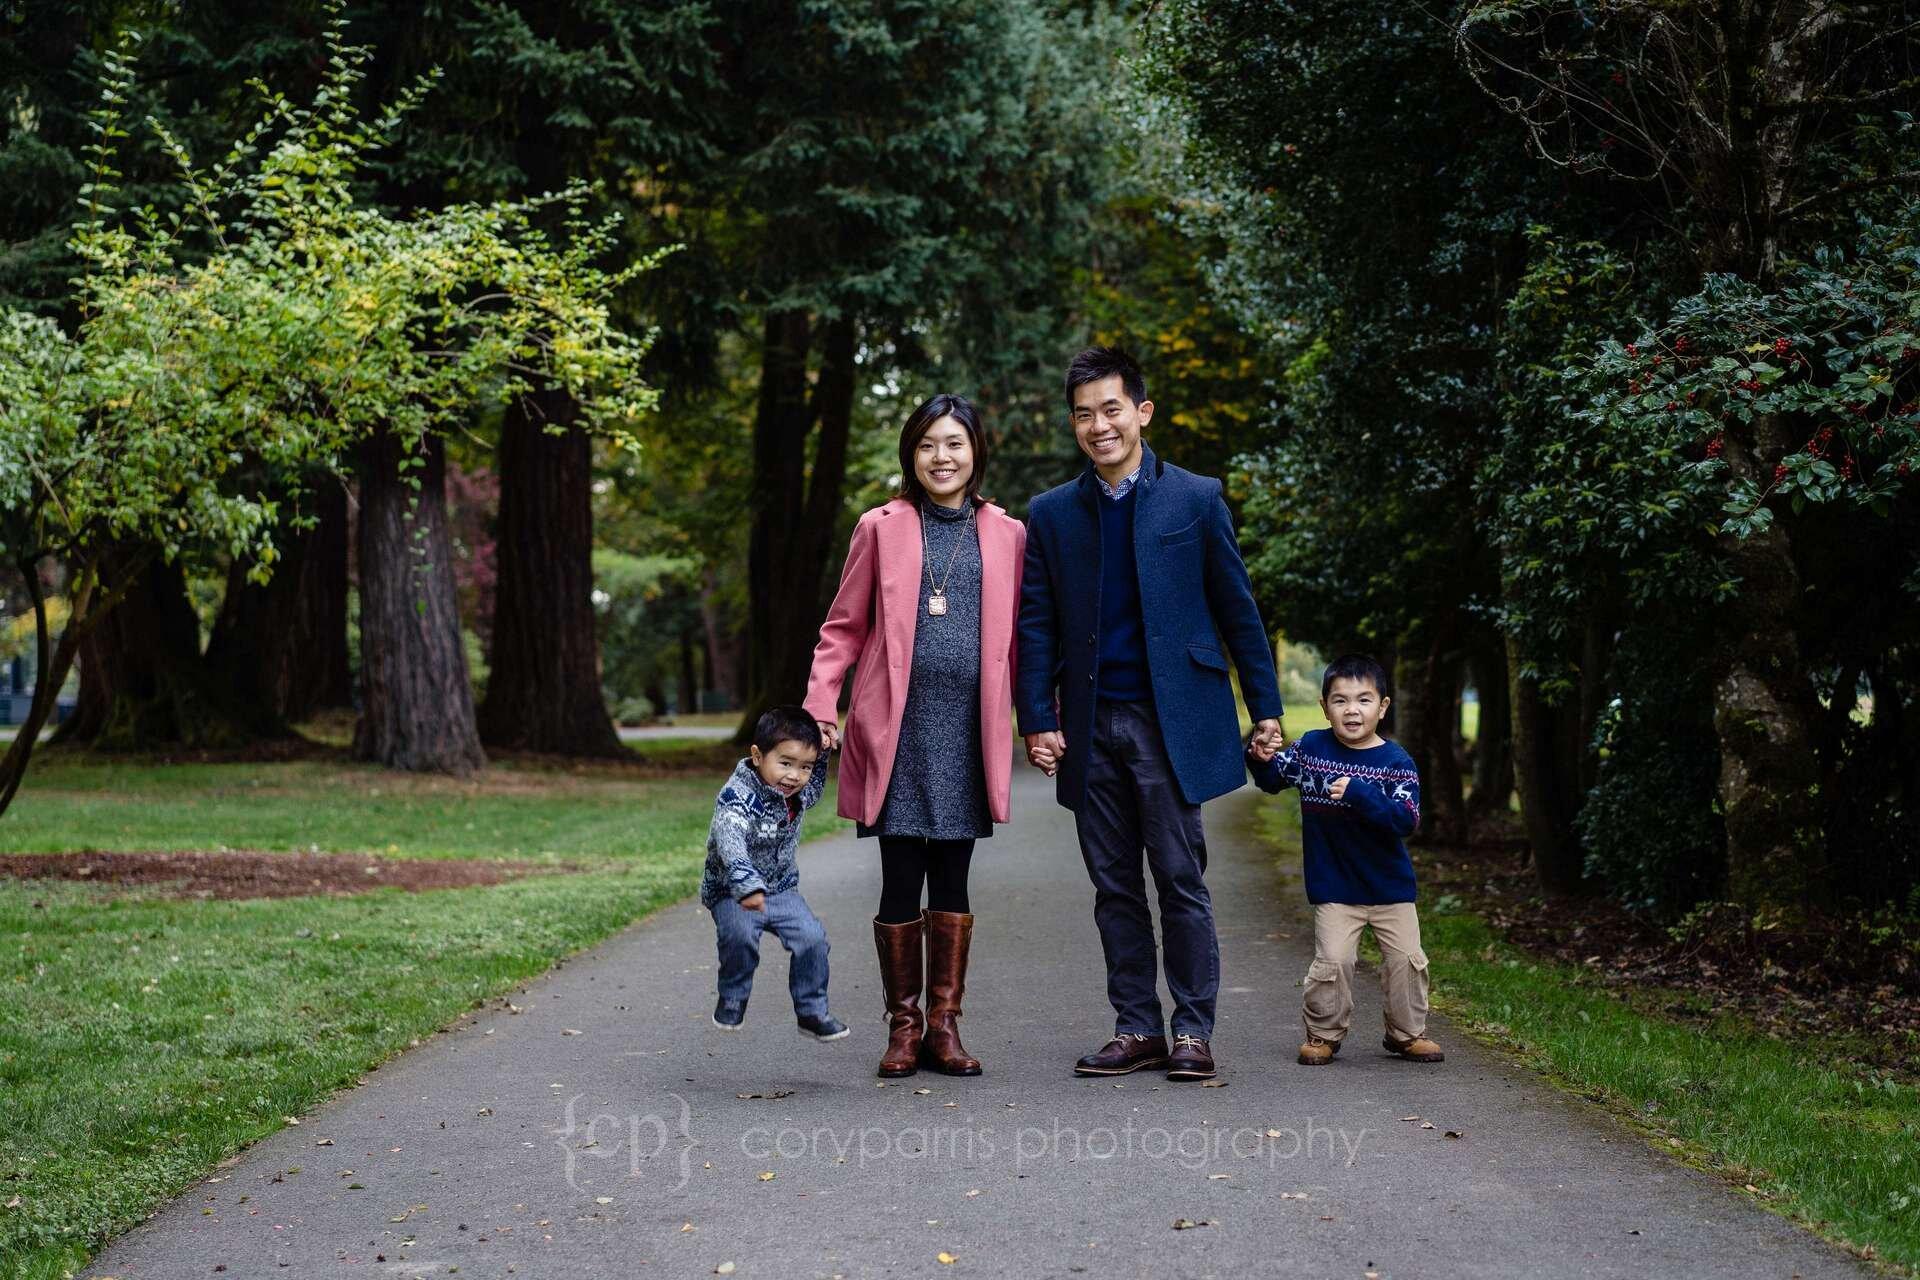 067-redmond-family-portrait-photography.jpg